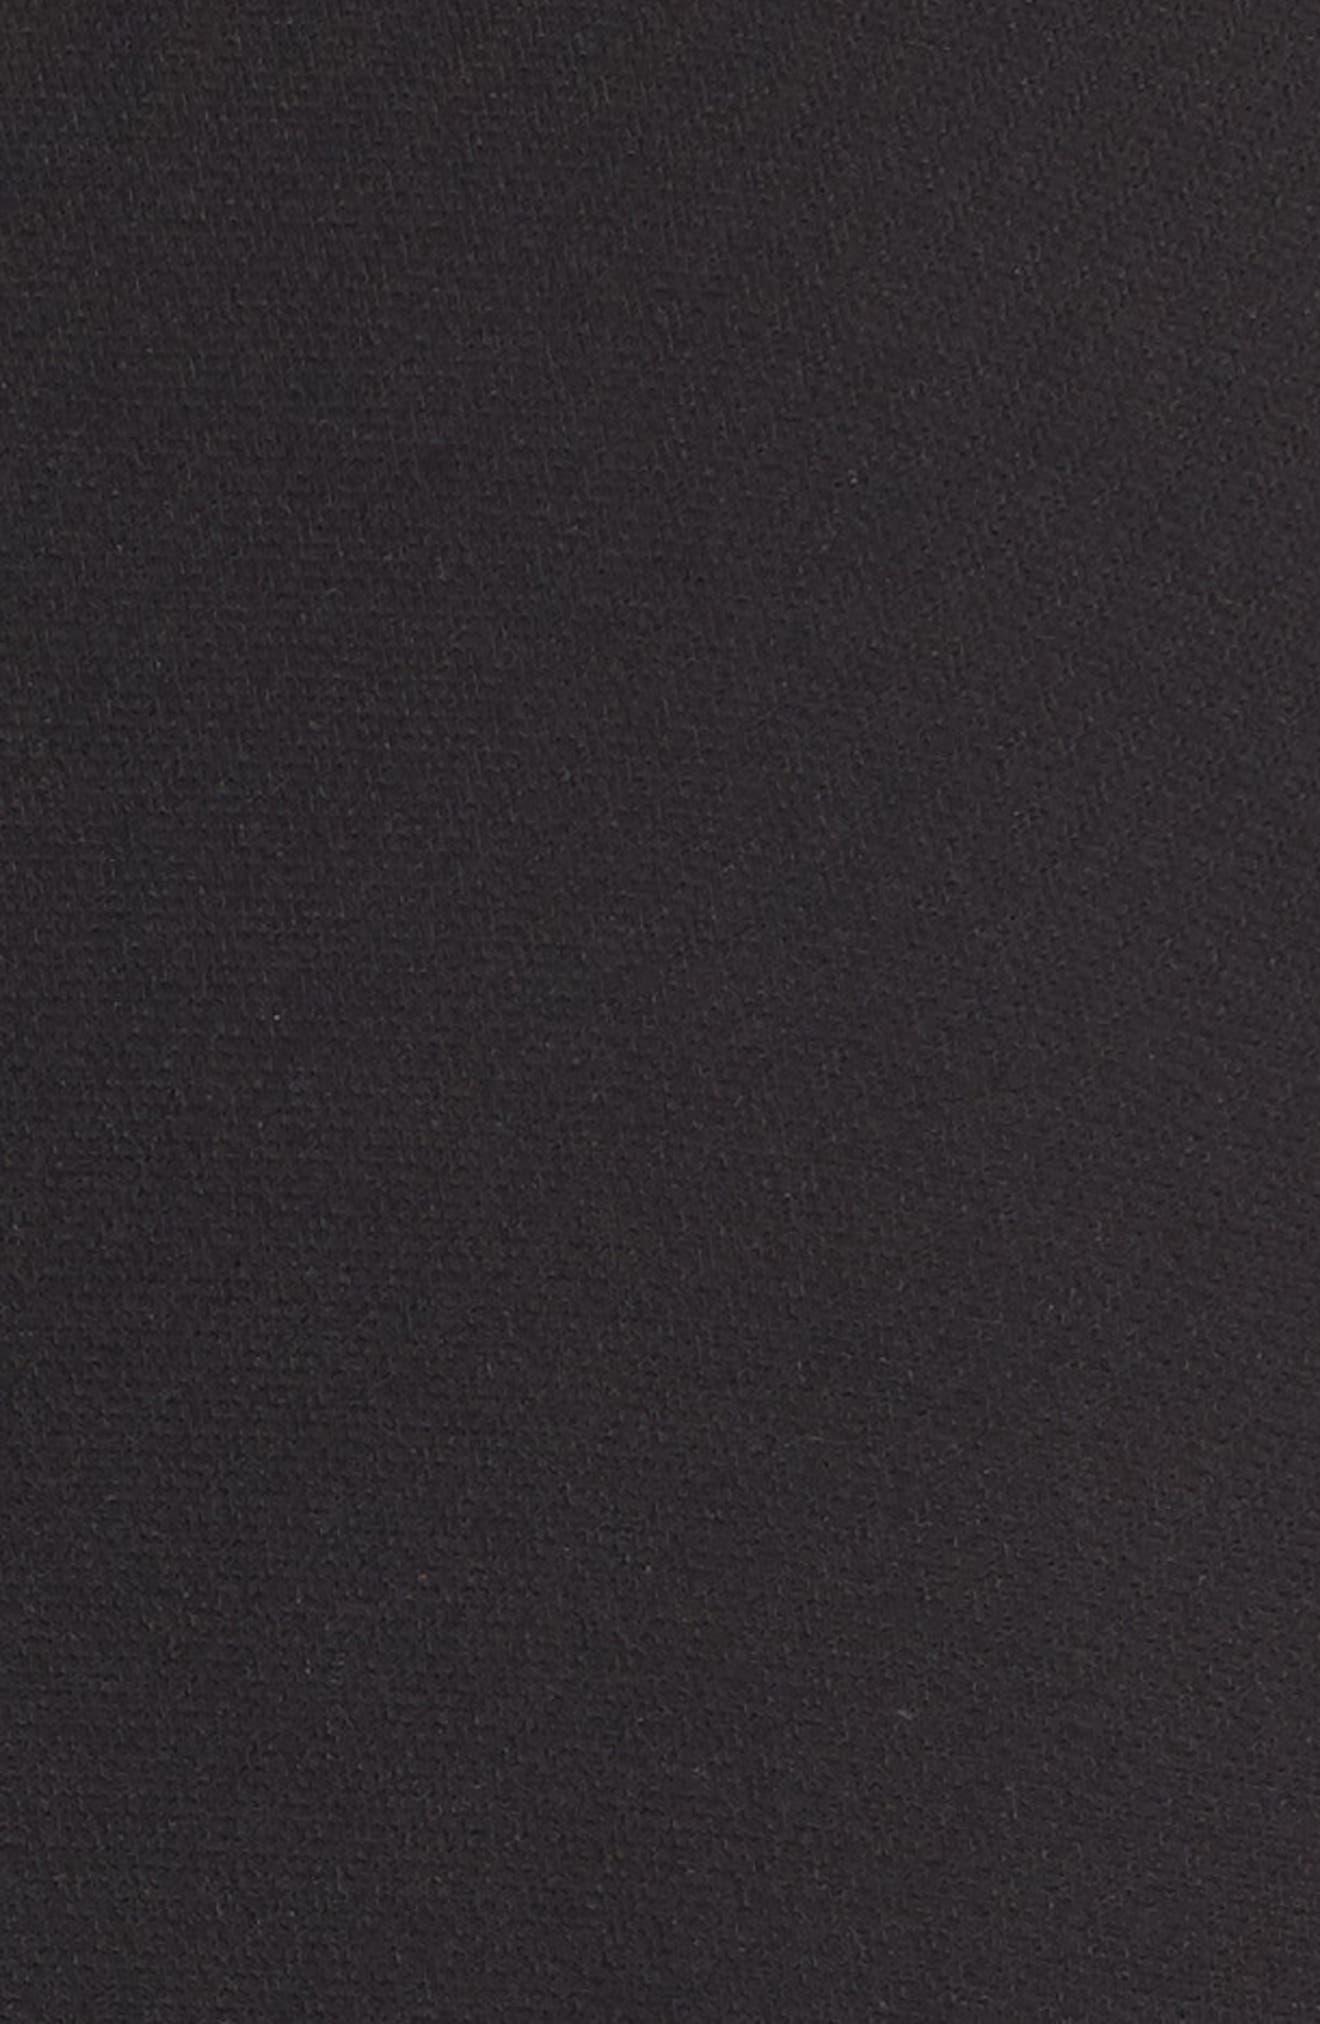 Ruffle Sleeve Blazer,                             Alternate thumbnail 6, color,                             001